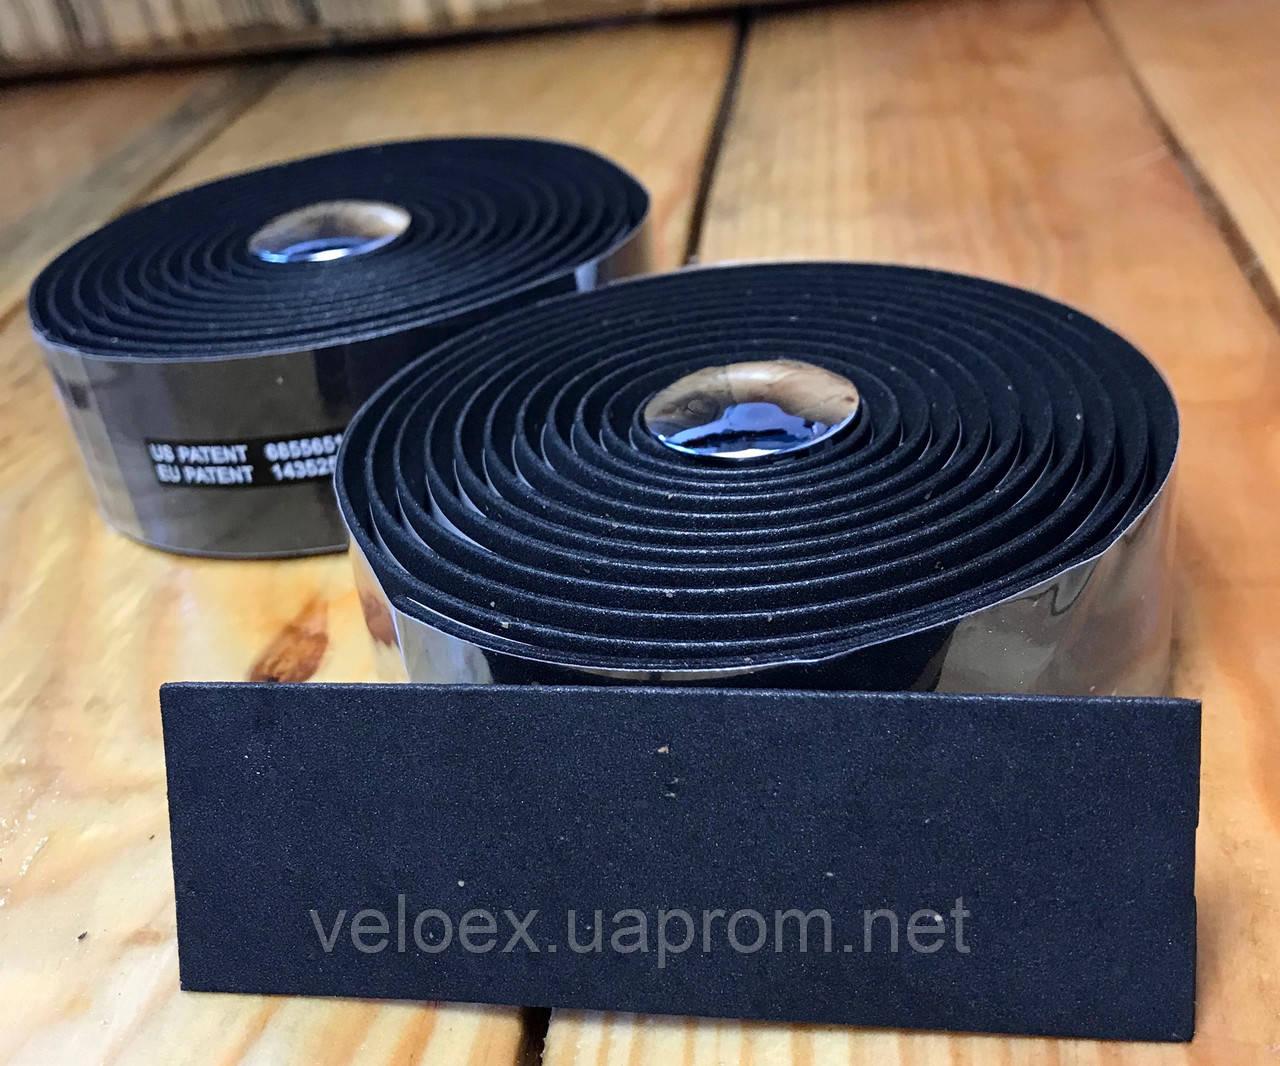 Обмотка руля Velo VLT1001SG пробка гель